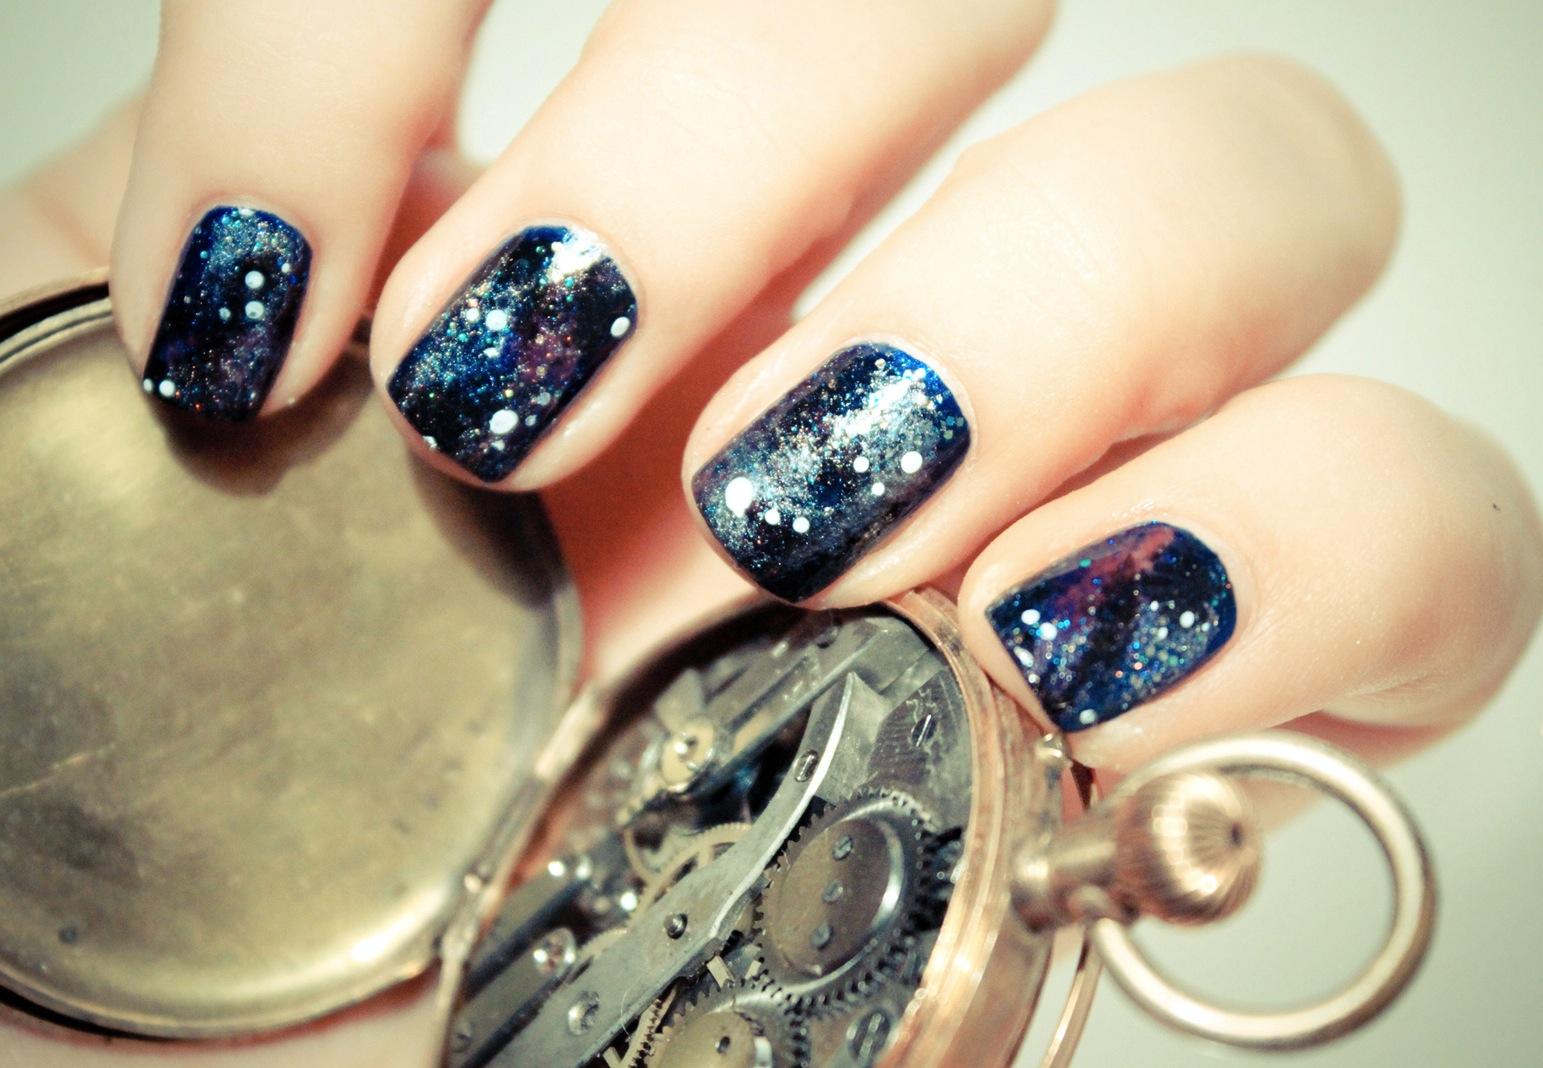 diy-nail-art-best-designs-cocoon-358394